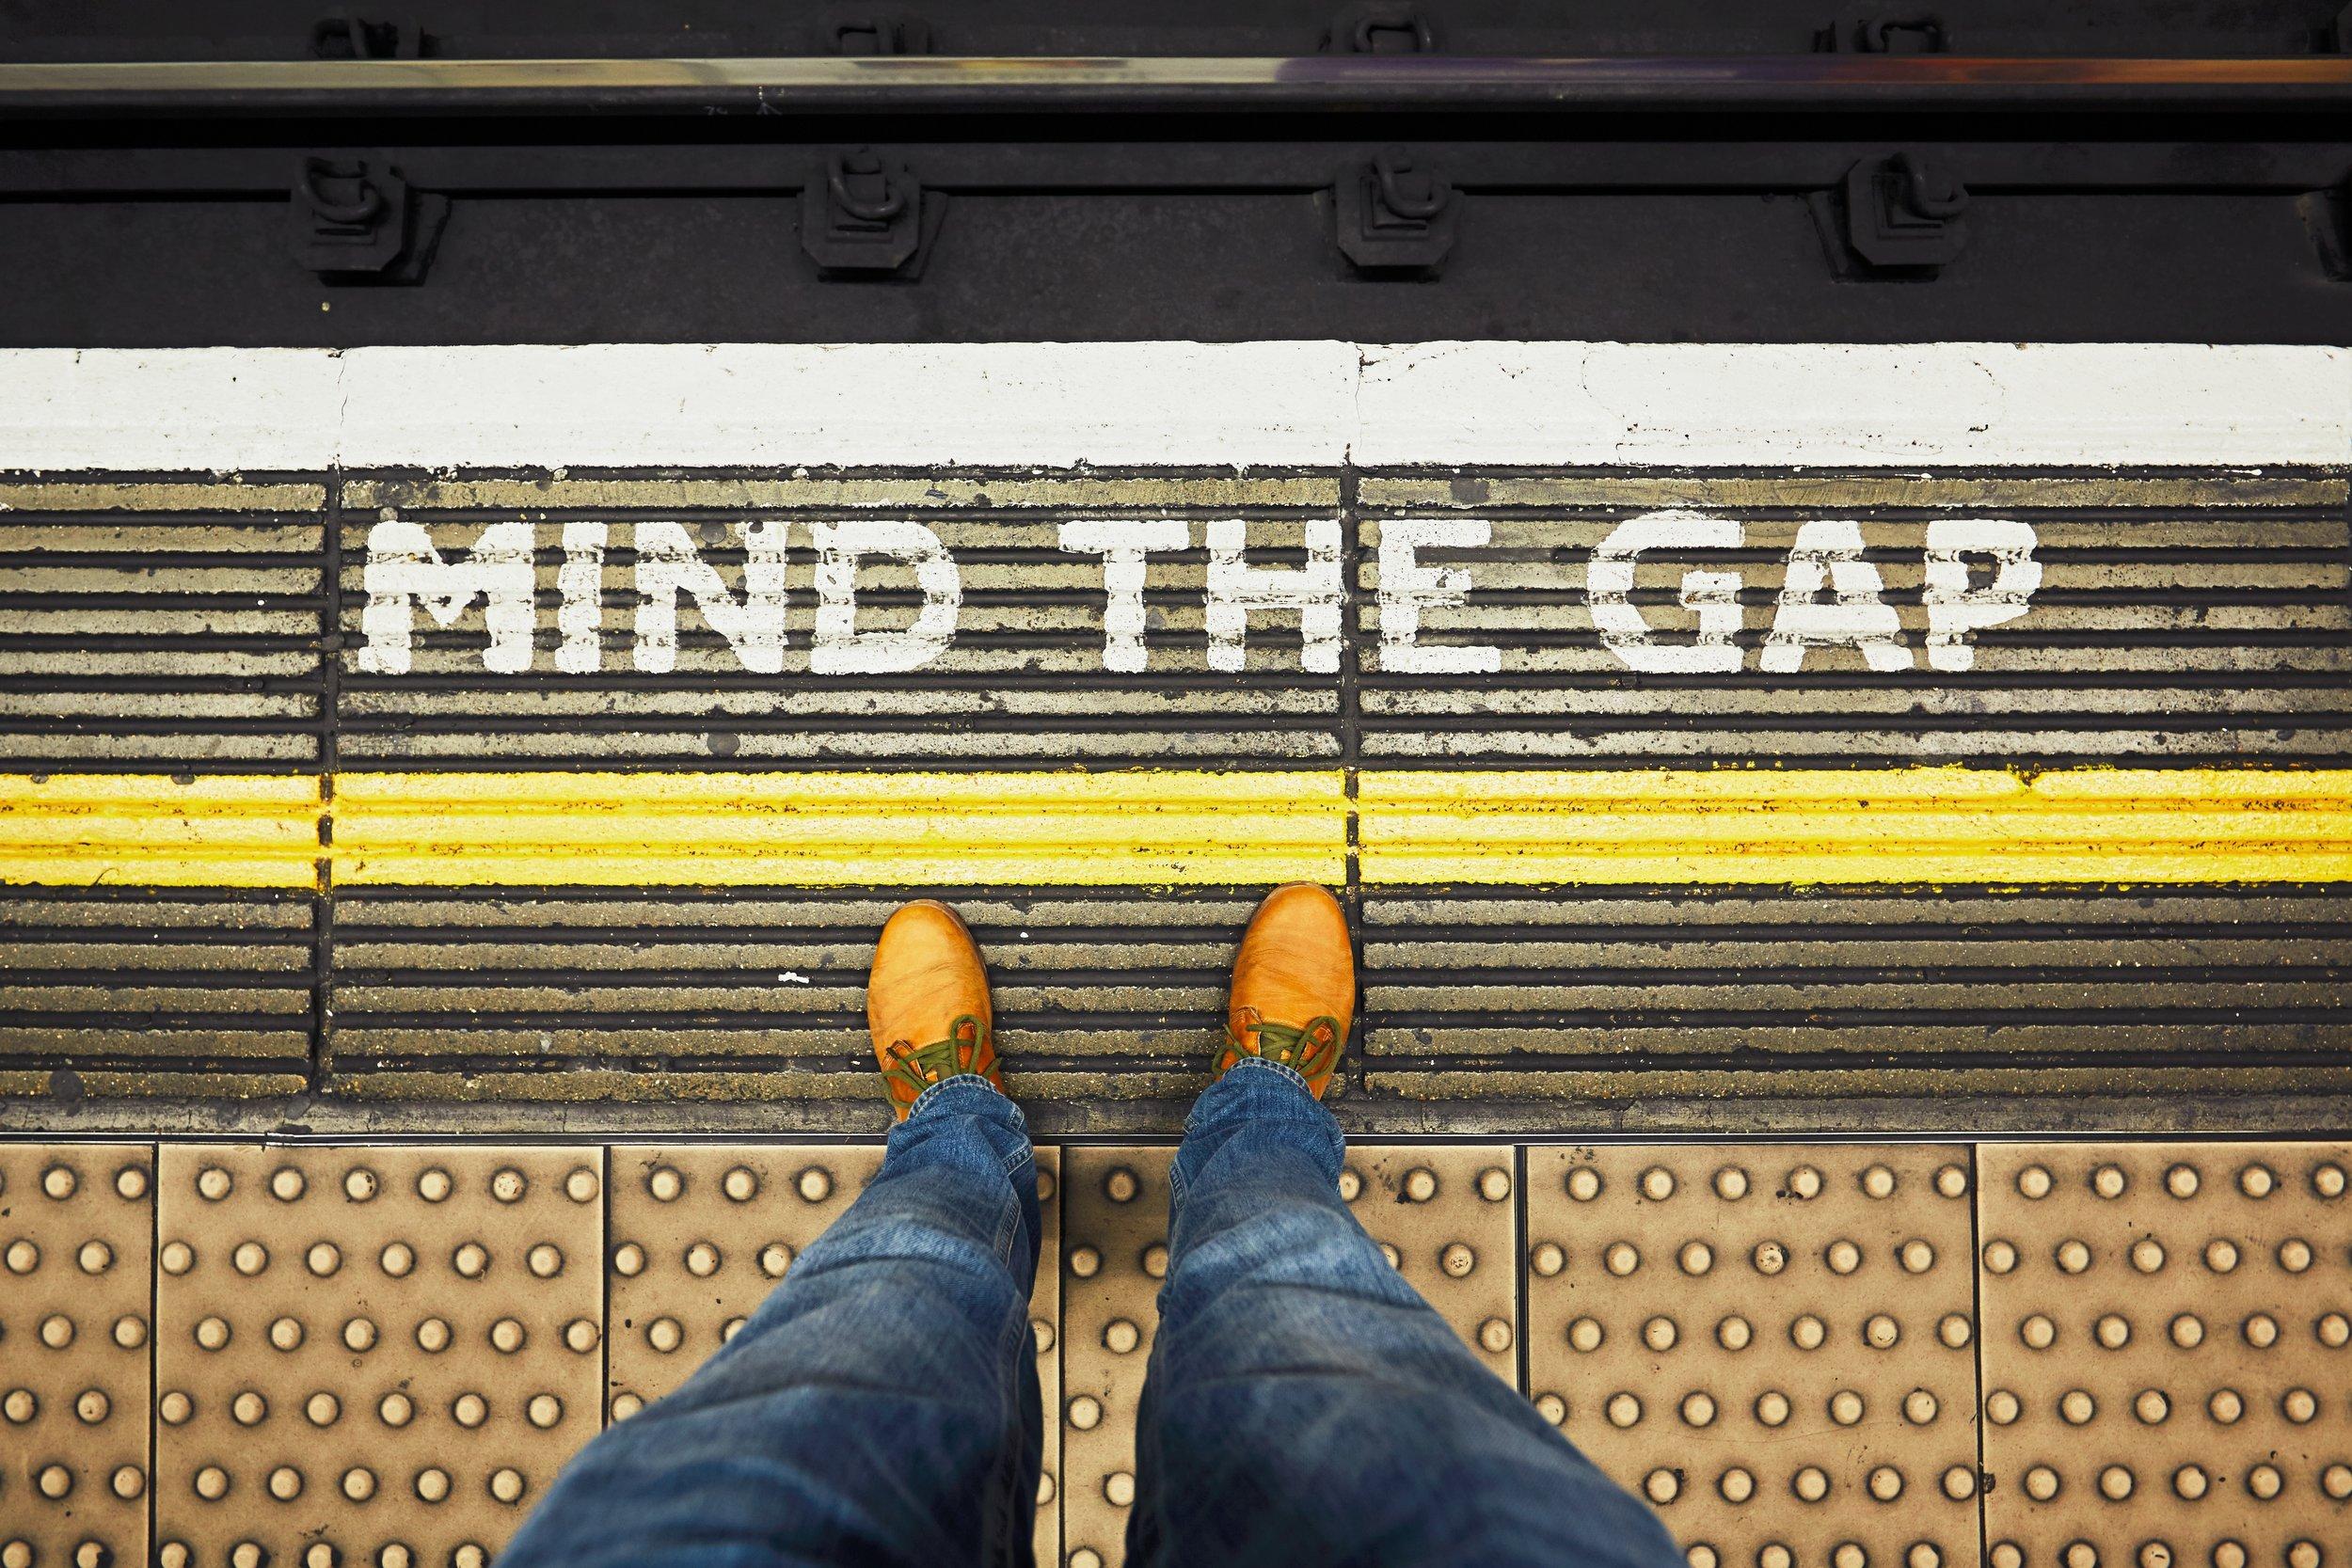 mind-the-gap-PKNPEUP.jpg